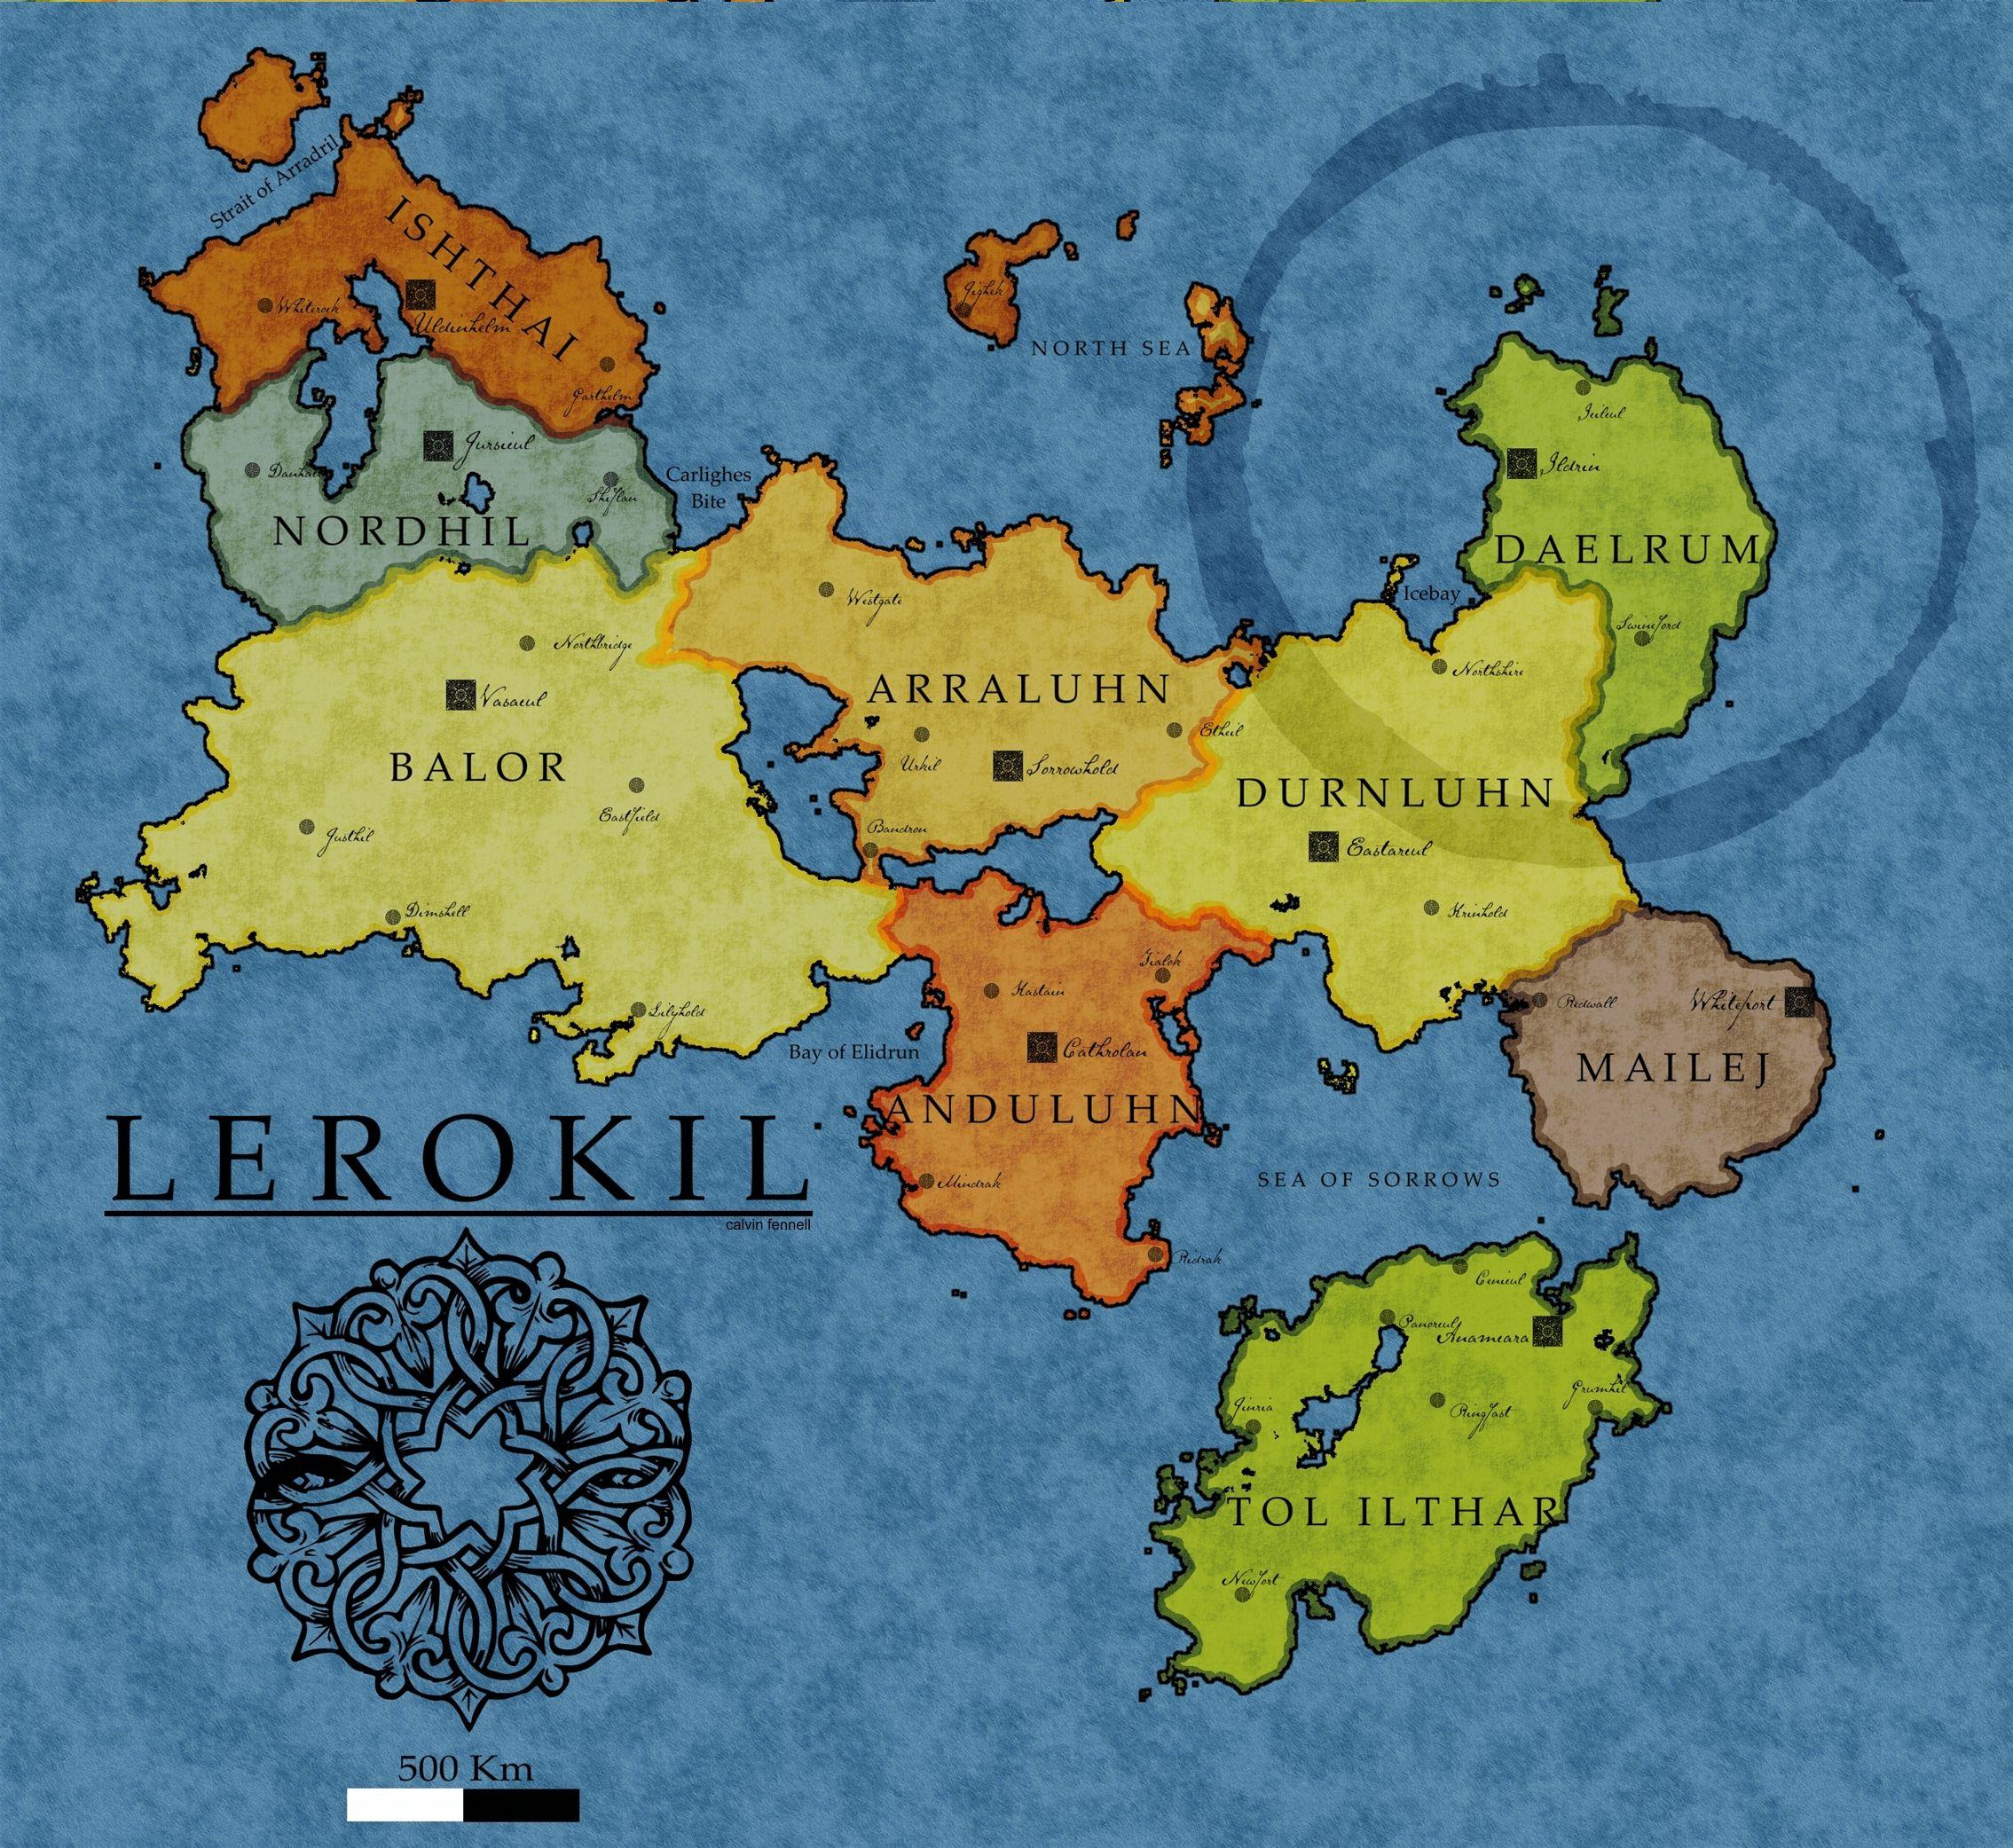 Fantasy Life World Map.Lerokil Fantasy Concepts In 2019 Pinterest Fantasy Map